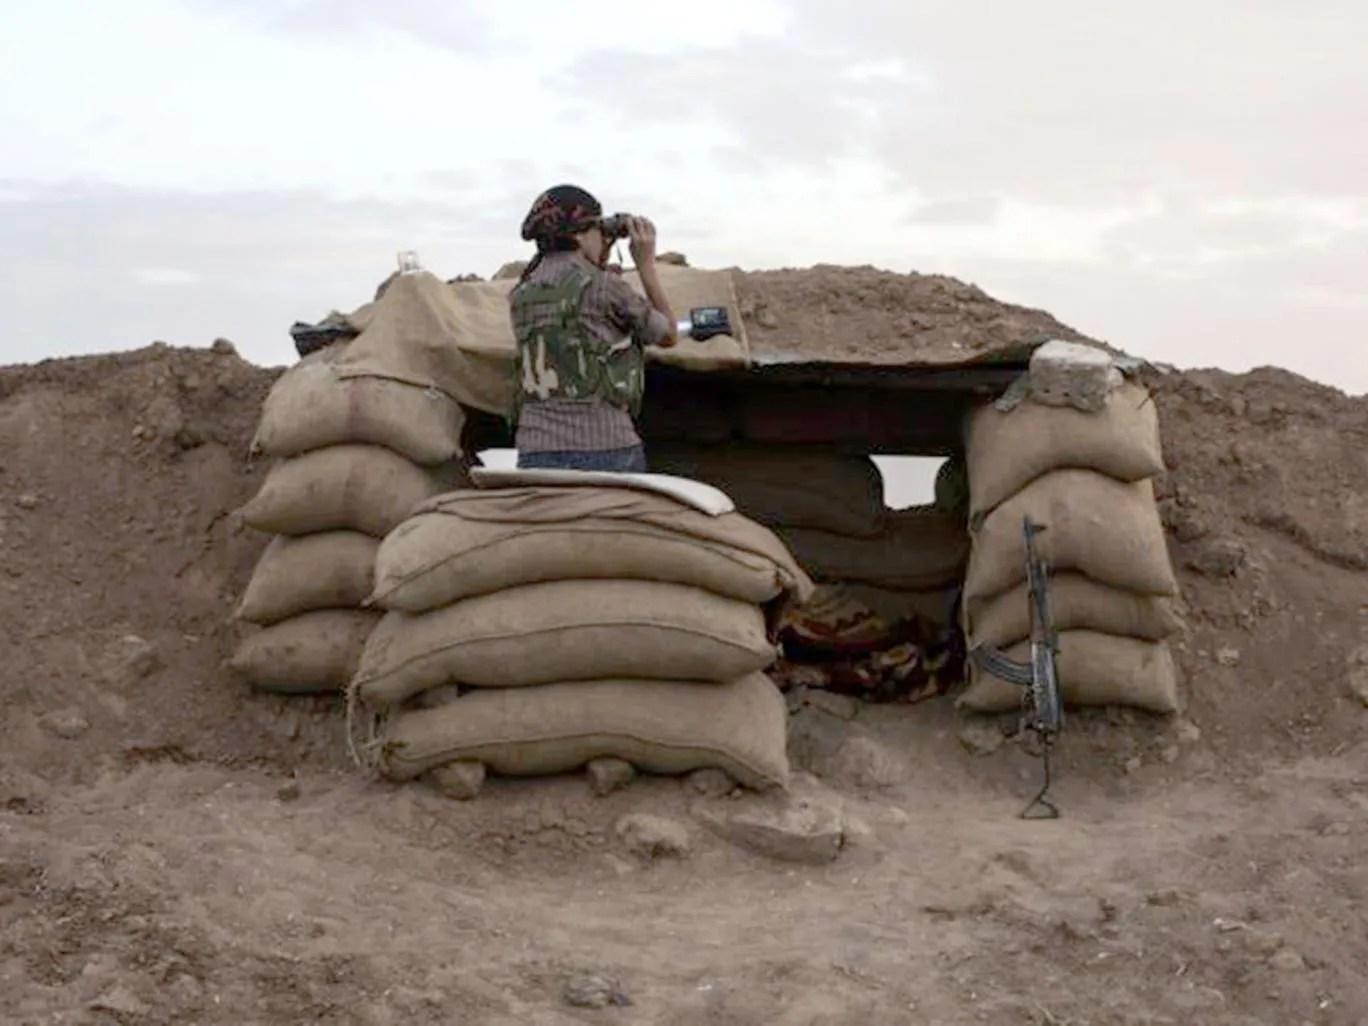 A Kurdish fighter surveys the border between Turkey and Iraq